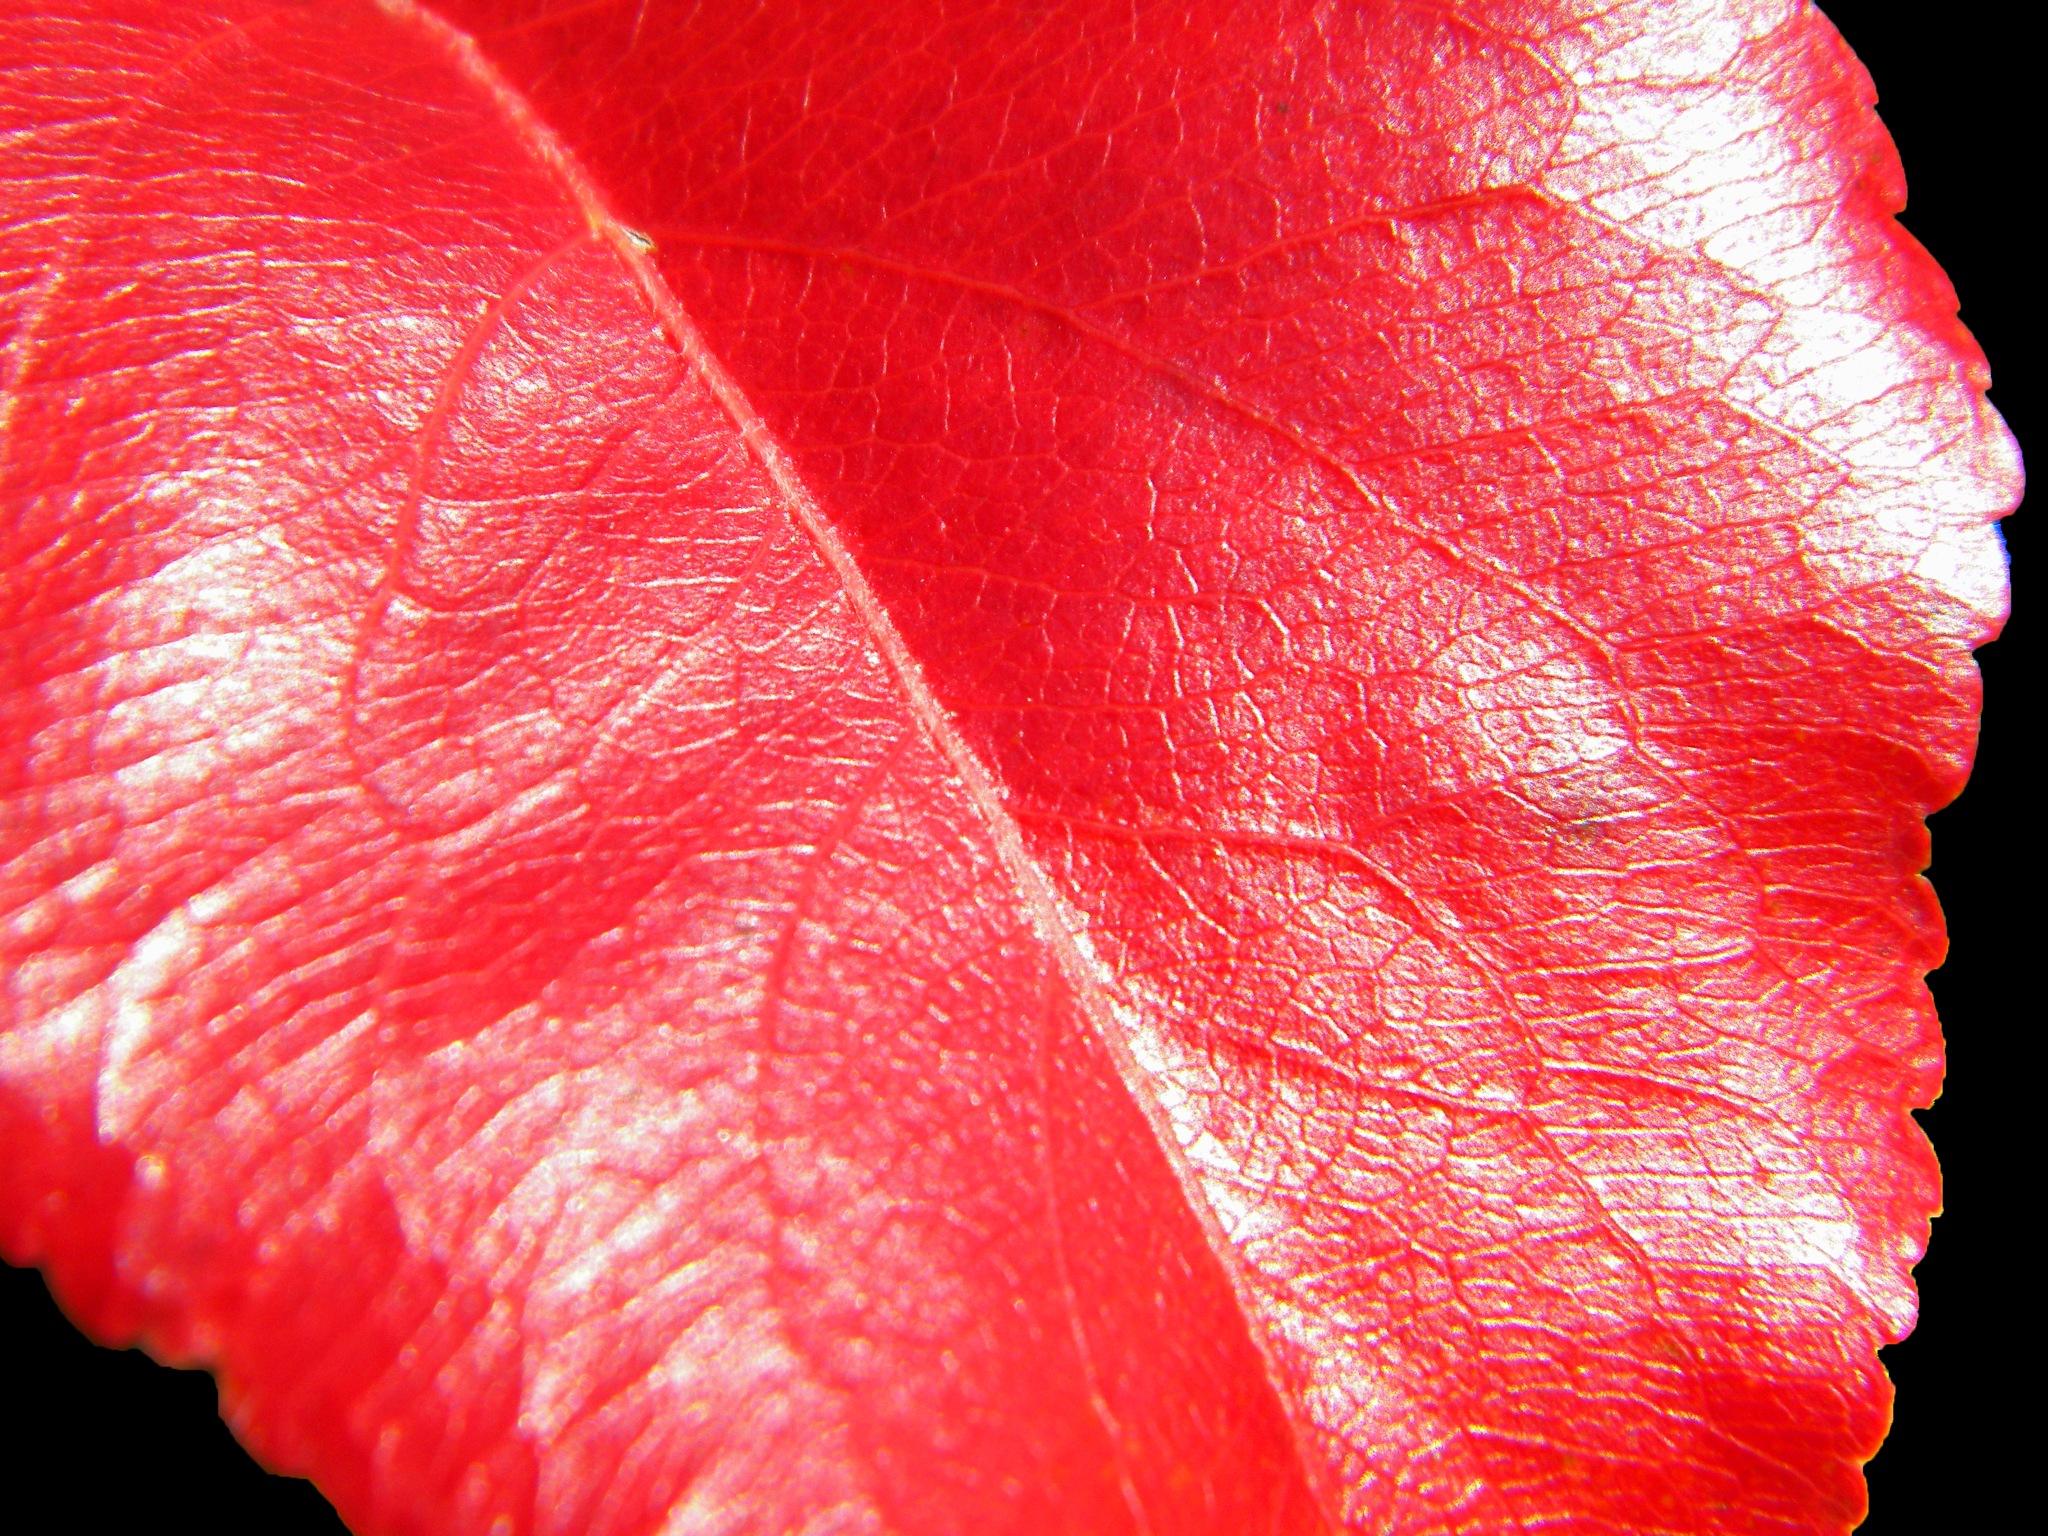 Red Leaf on Black by Phillip W. Strunk